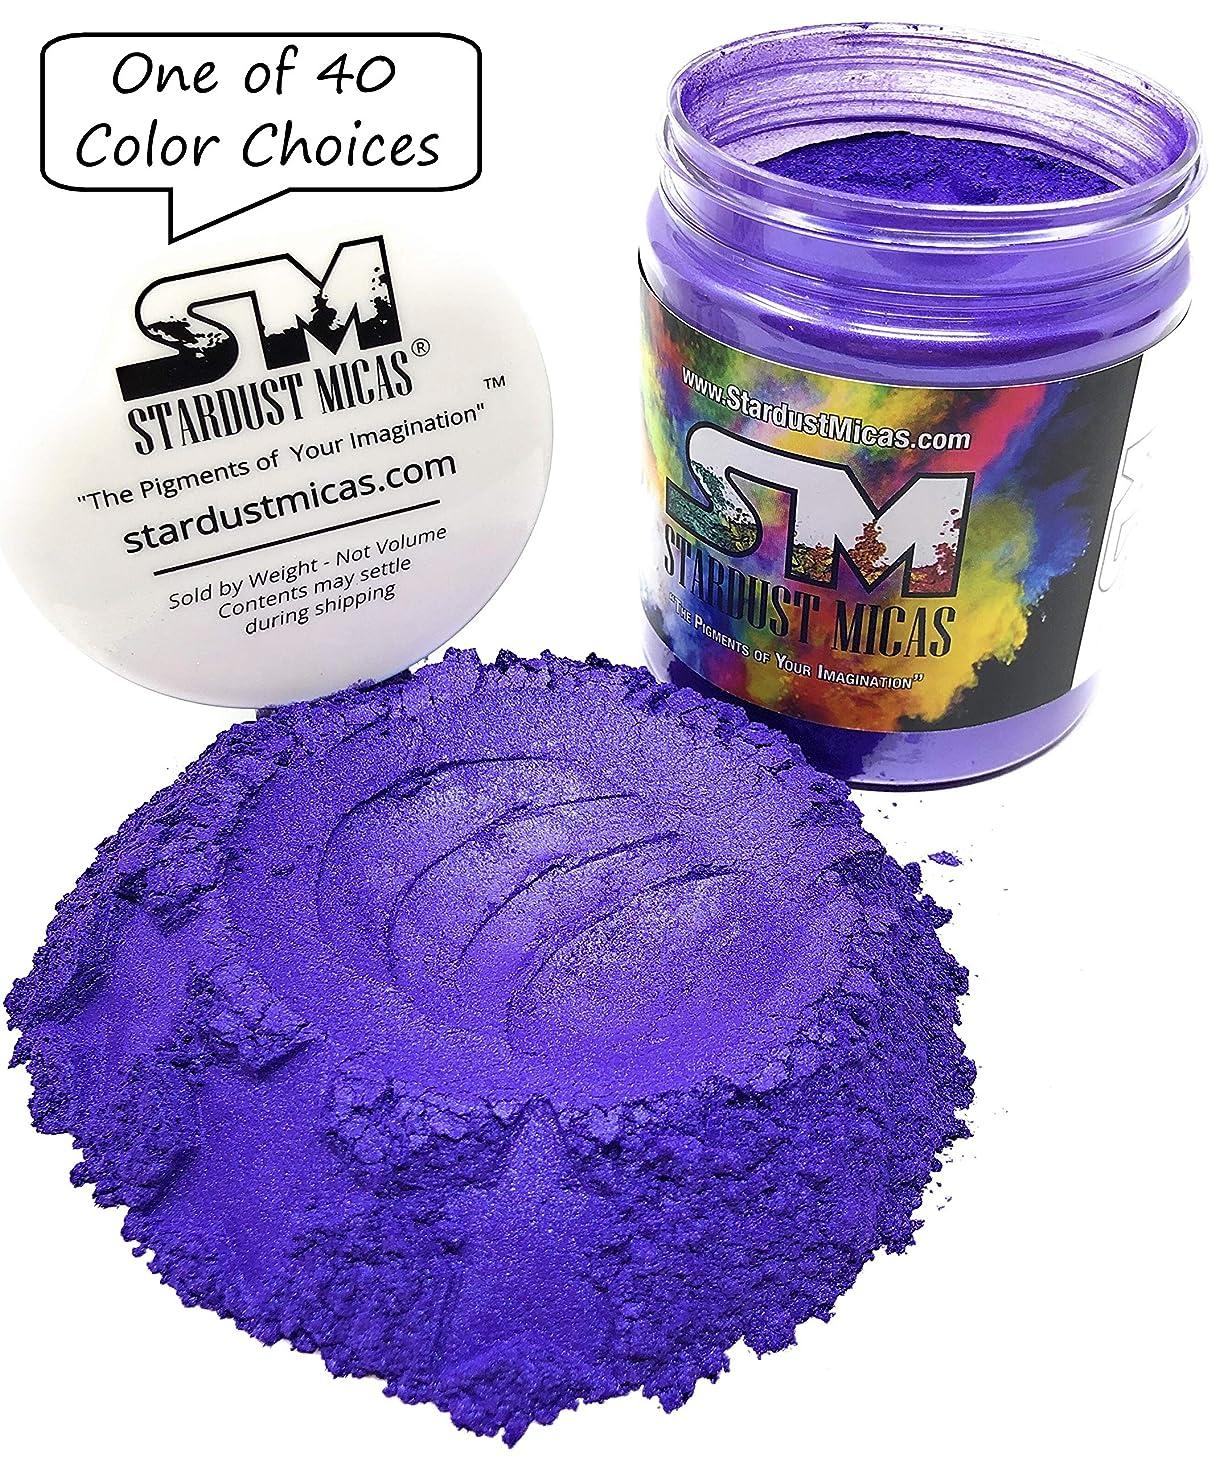 Dark Purple Pigment Powder for Resin Fluid Art, Cosmetic Grade Colorant for Soap Making, Nails, DIY Crafting Projects, Metallic Purple Mica Pigment Powder Stardust Micas (Deeper Purple, 72 Gram Jar)